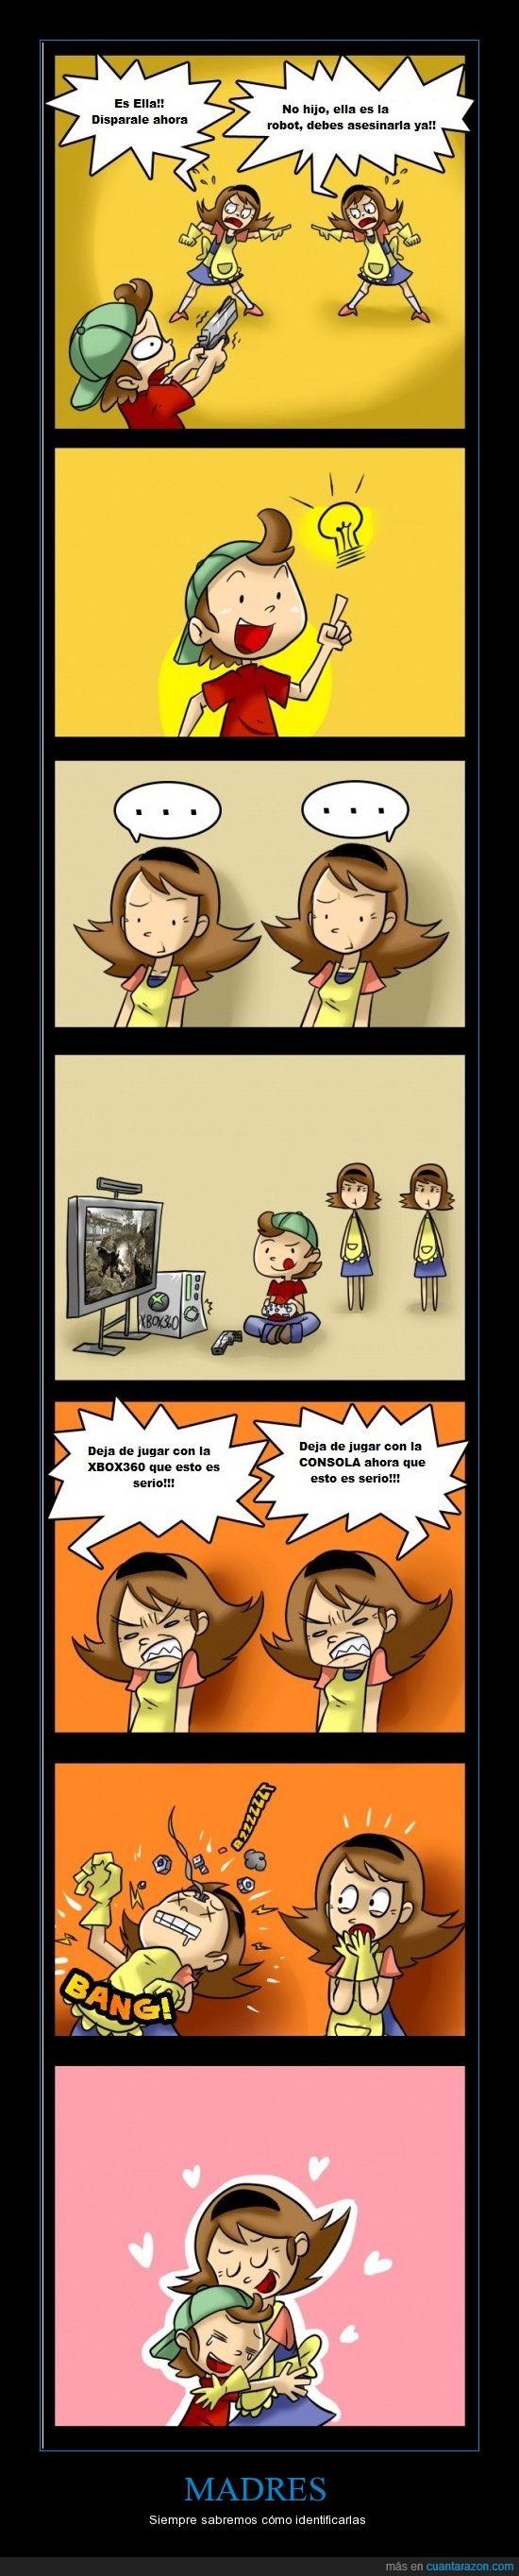 comic,consola,madre,niño,reconocer,robot,xbox